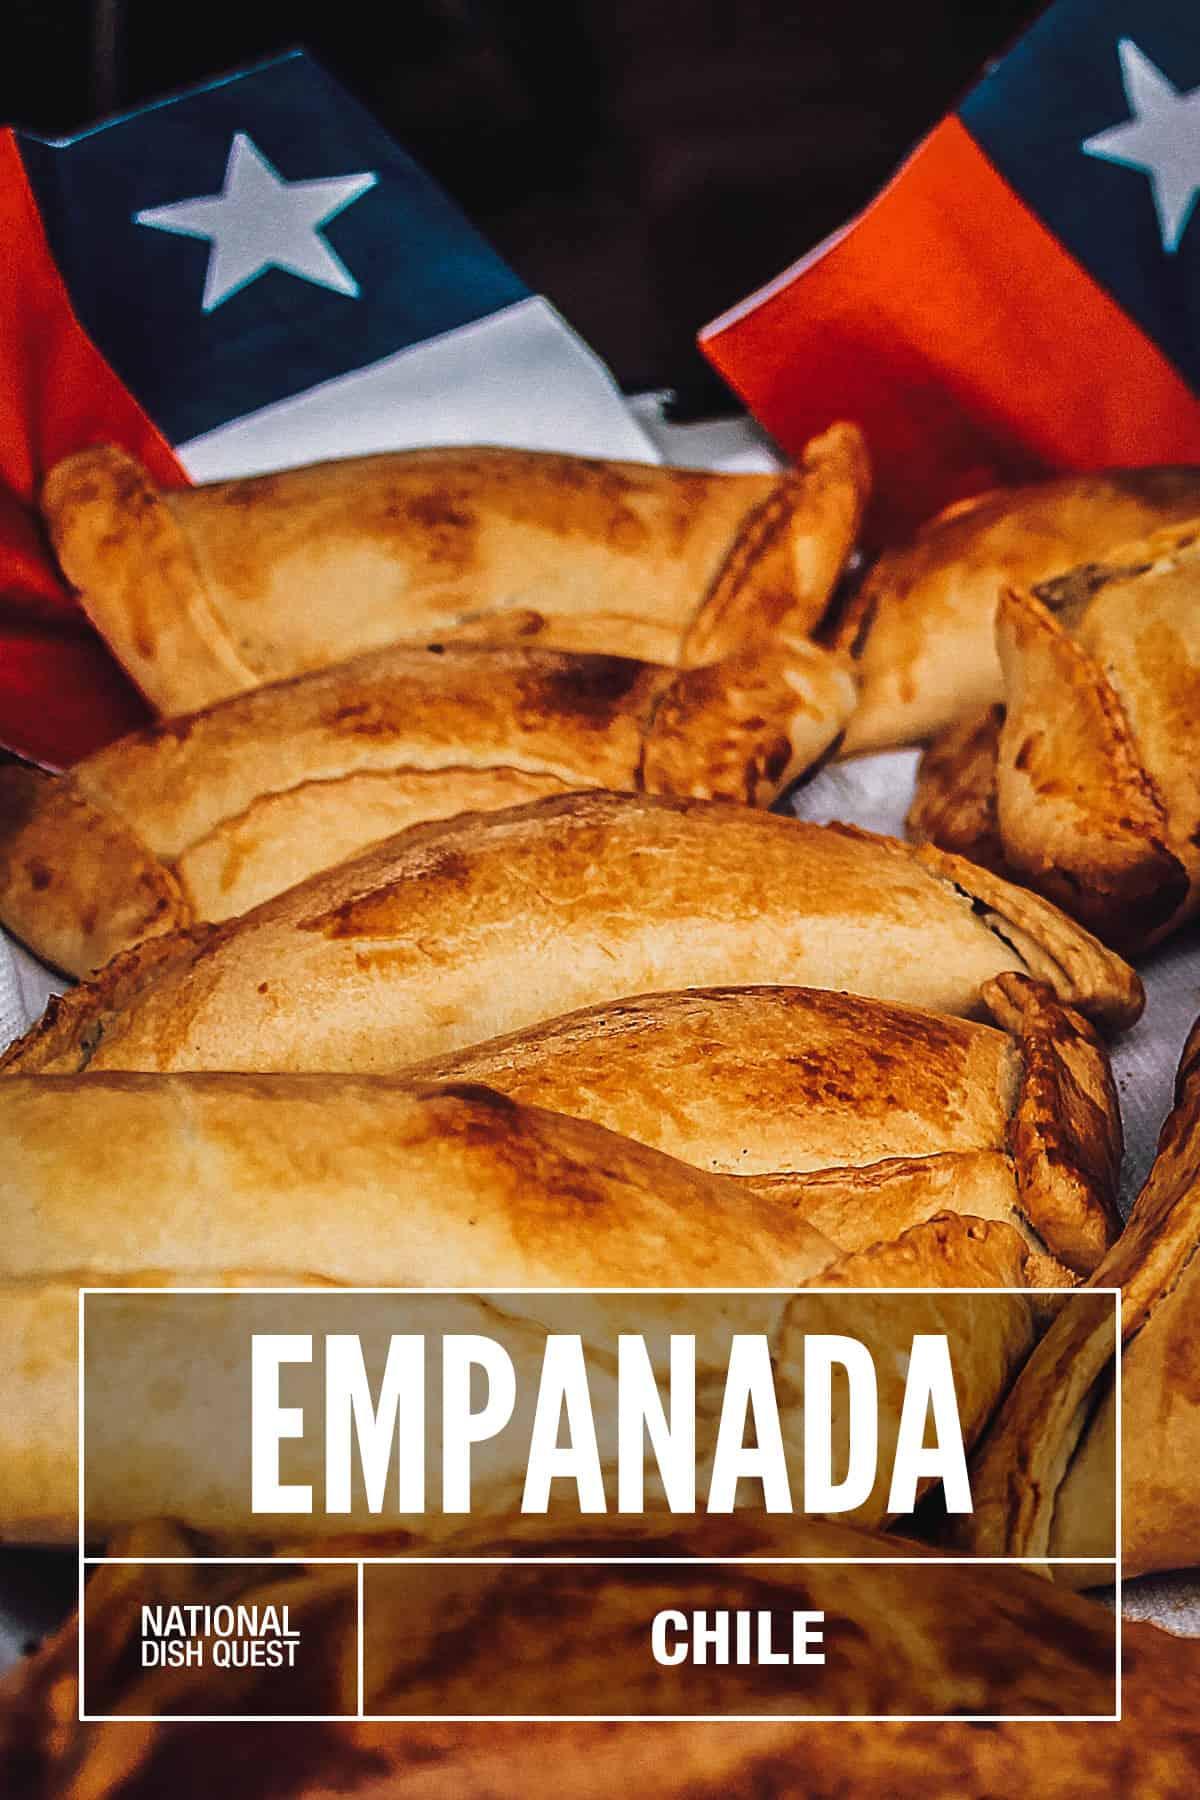 Tray of Chilean empanadas